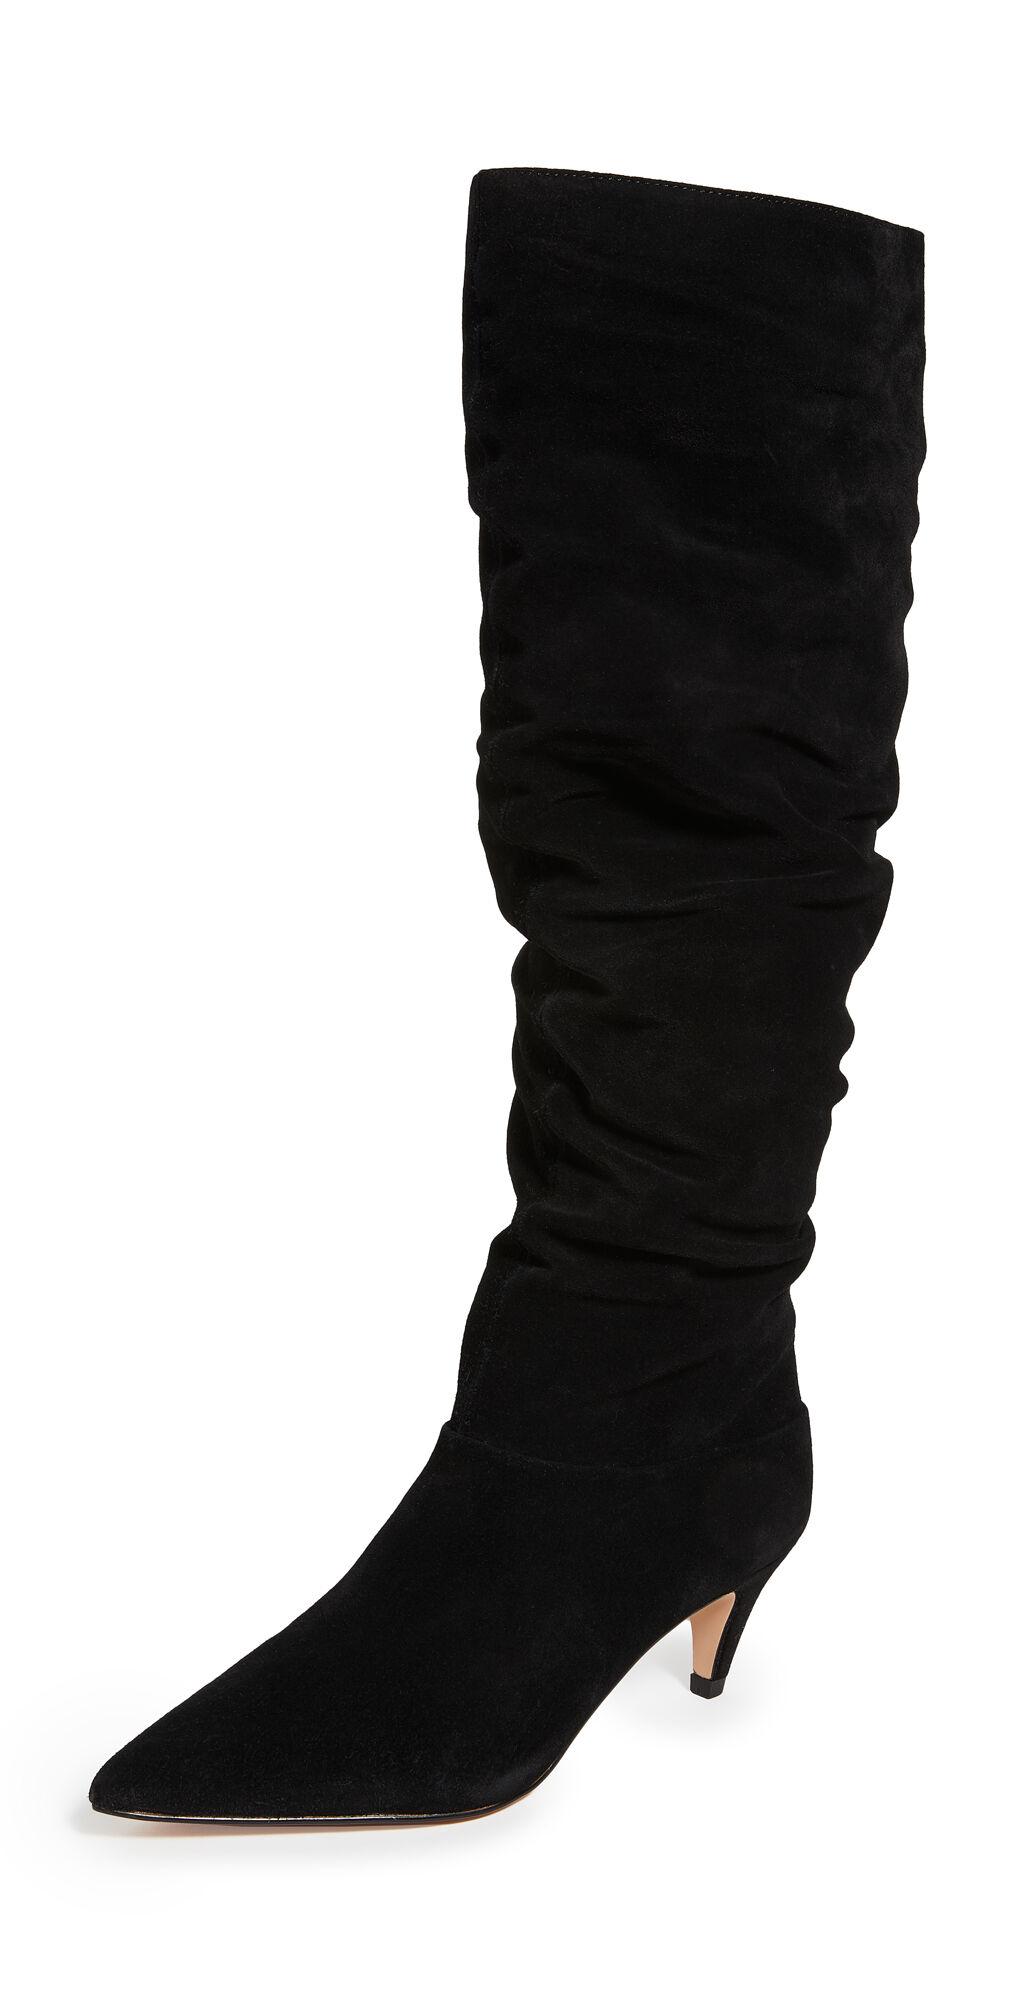 Villa Rouge Scarlett Knee High Boots  - Black - Size: 8